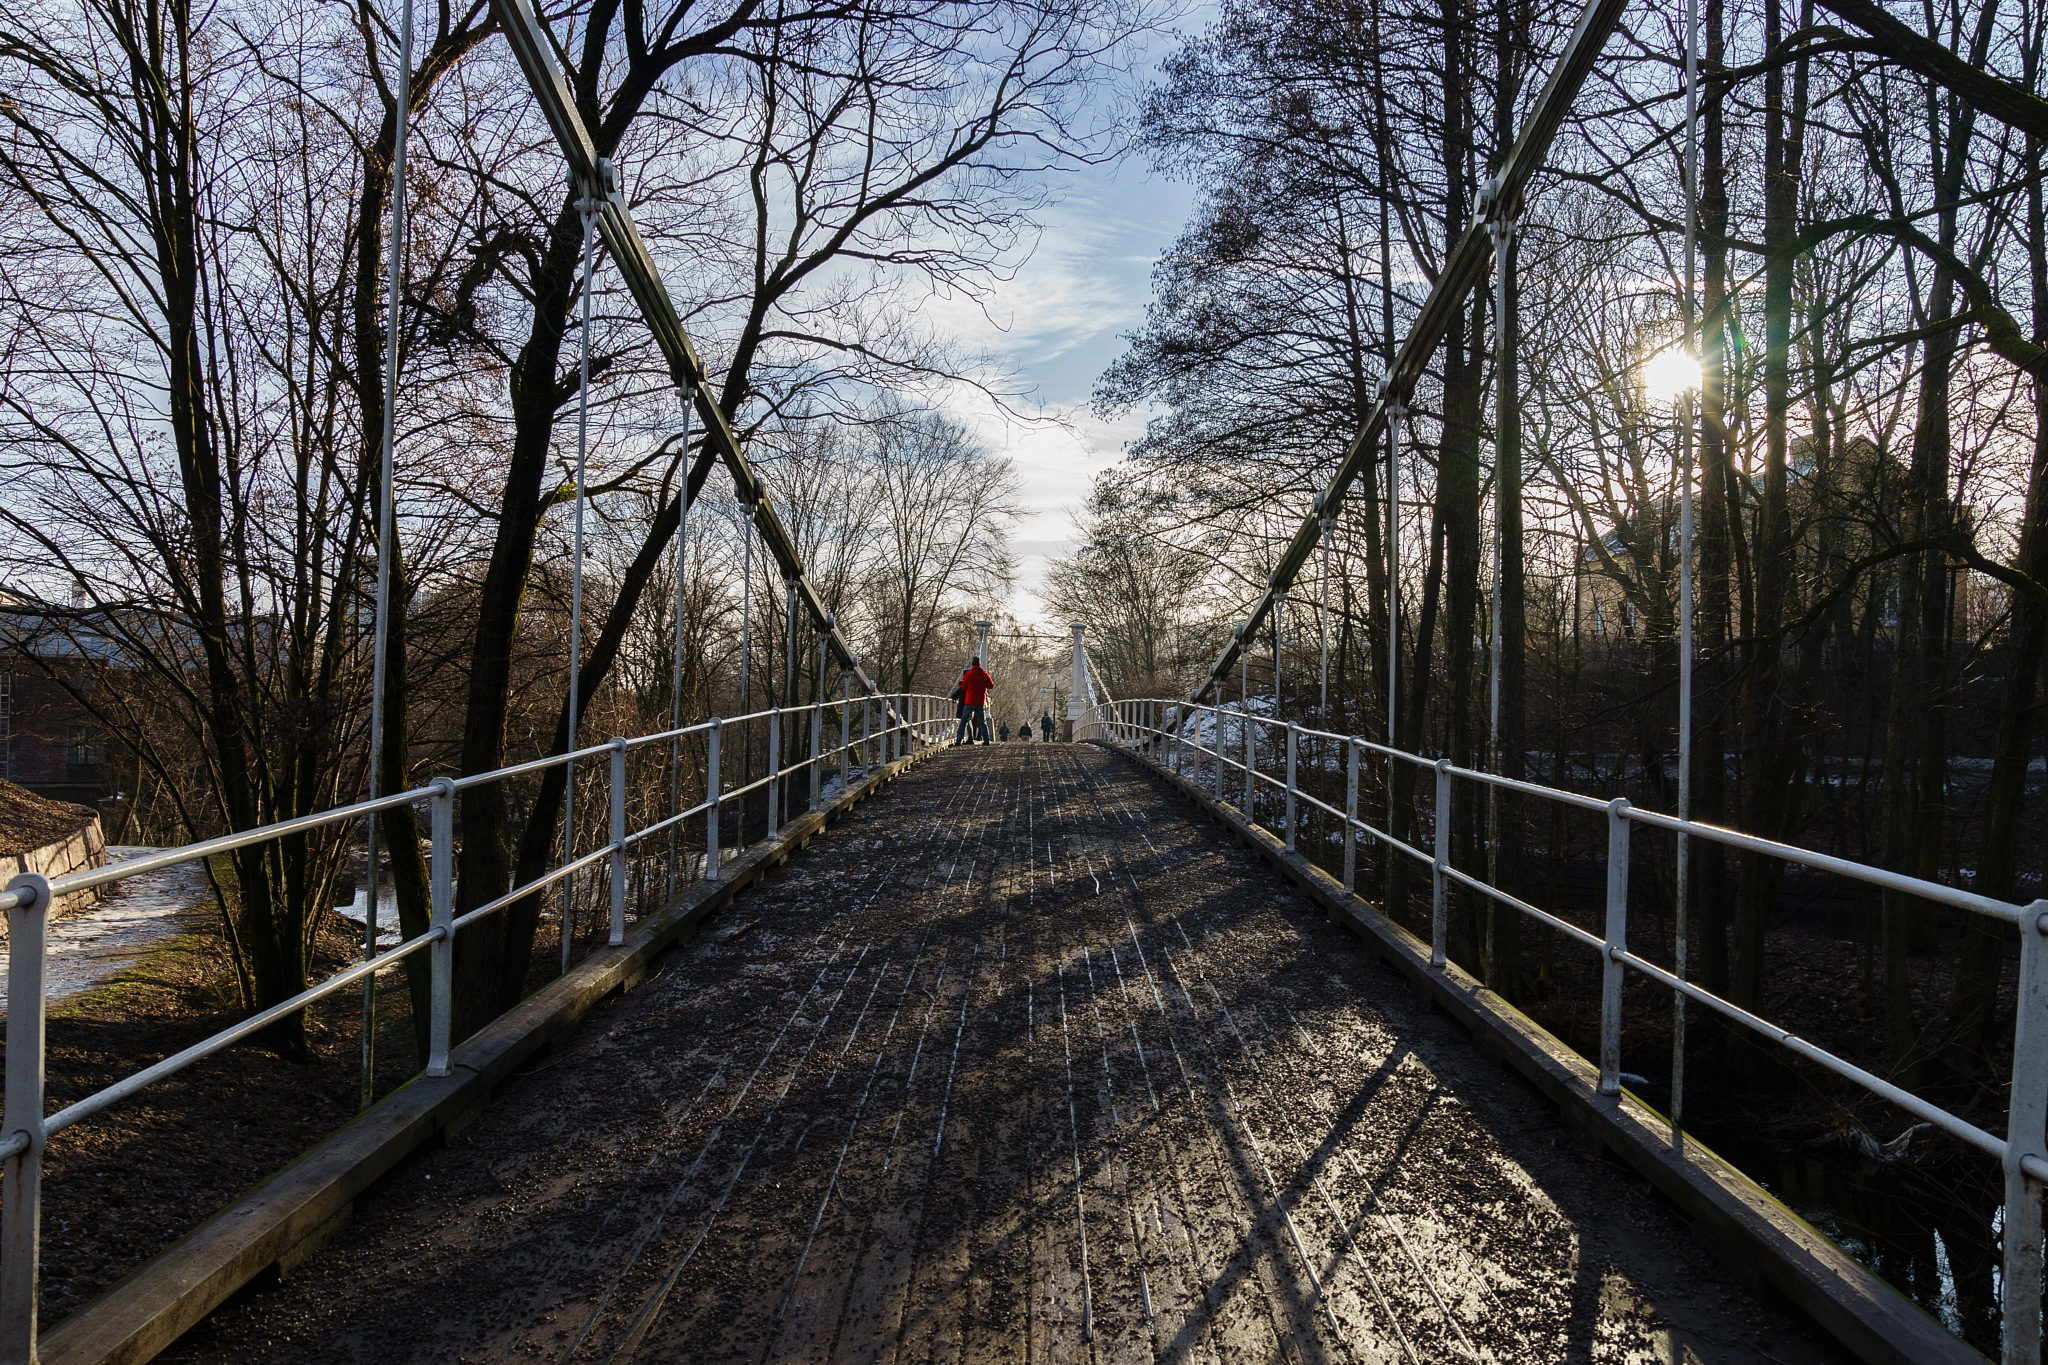 Aamodt bridge at Grünerløkka by JonArneFoss